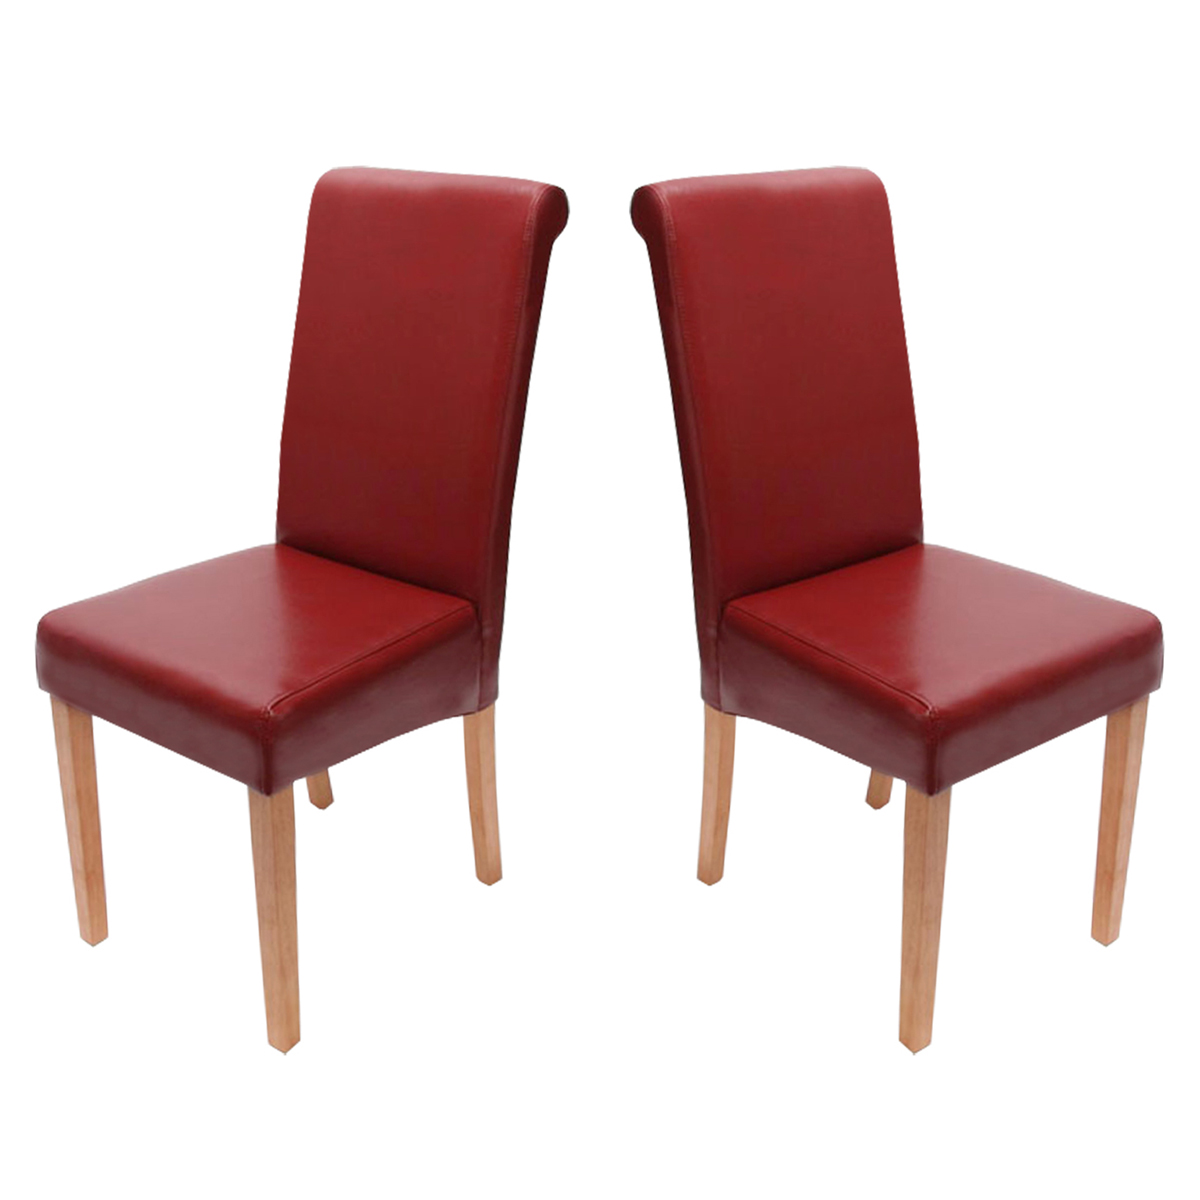 2x esszimmerstuhl stuhl novara ii leder schwarz creme wei rot braun grau ebay. Black Bedroom Furniture Sets. Home Design Ideas